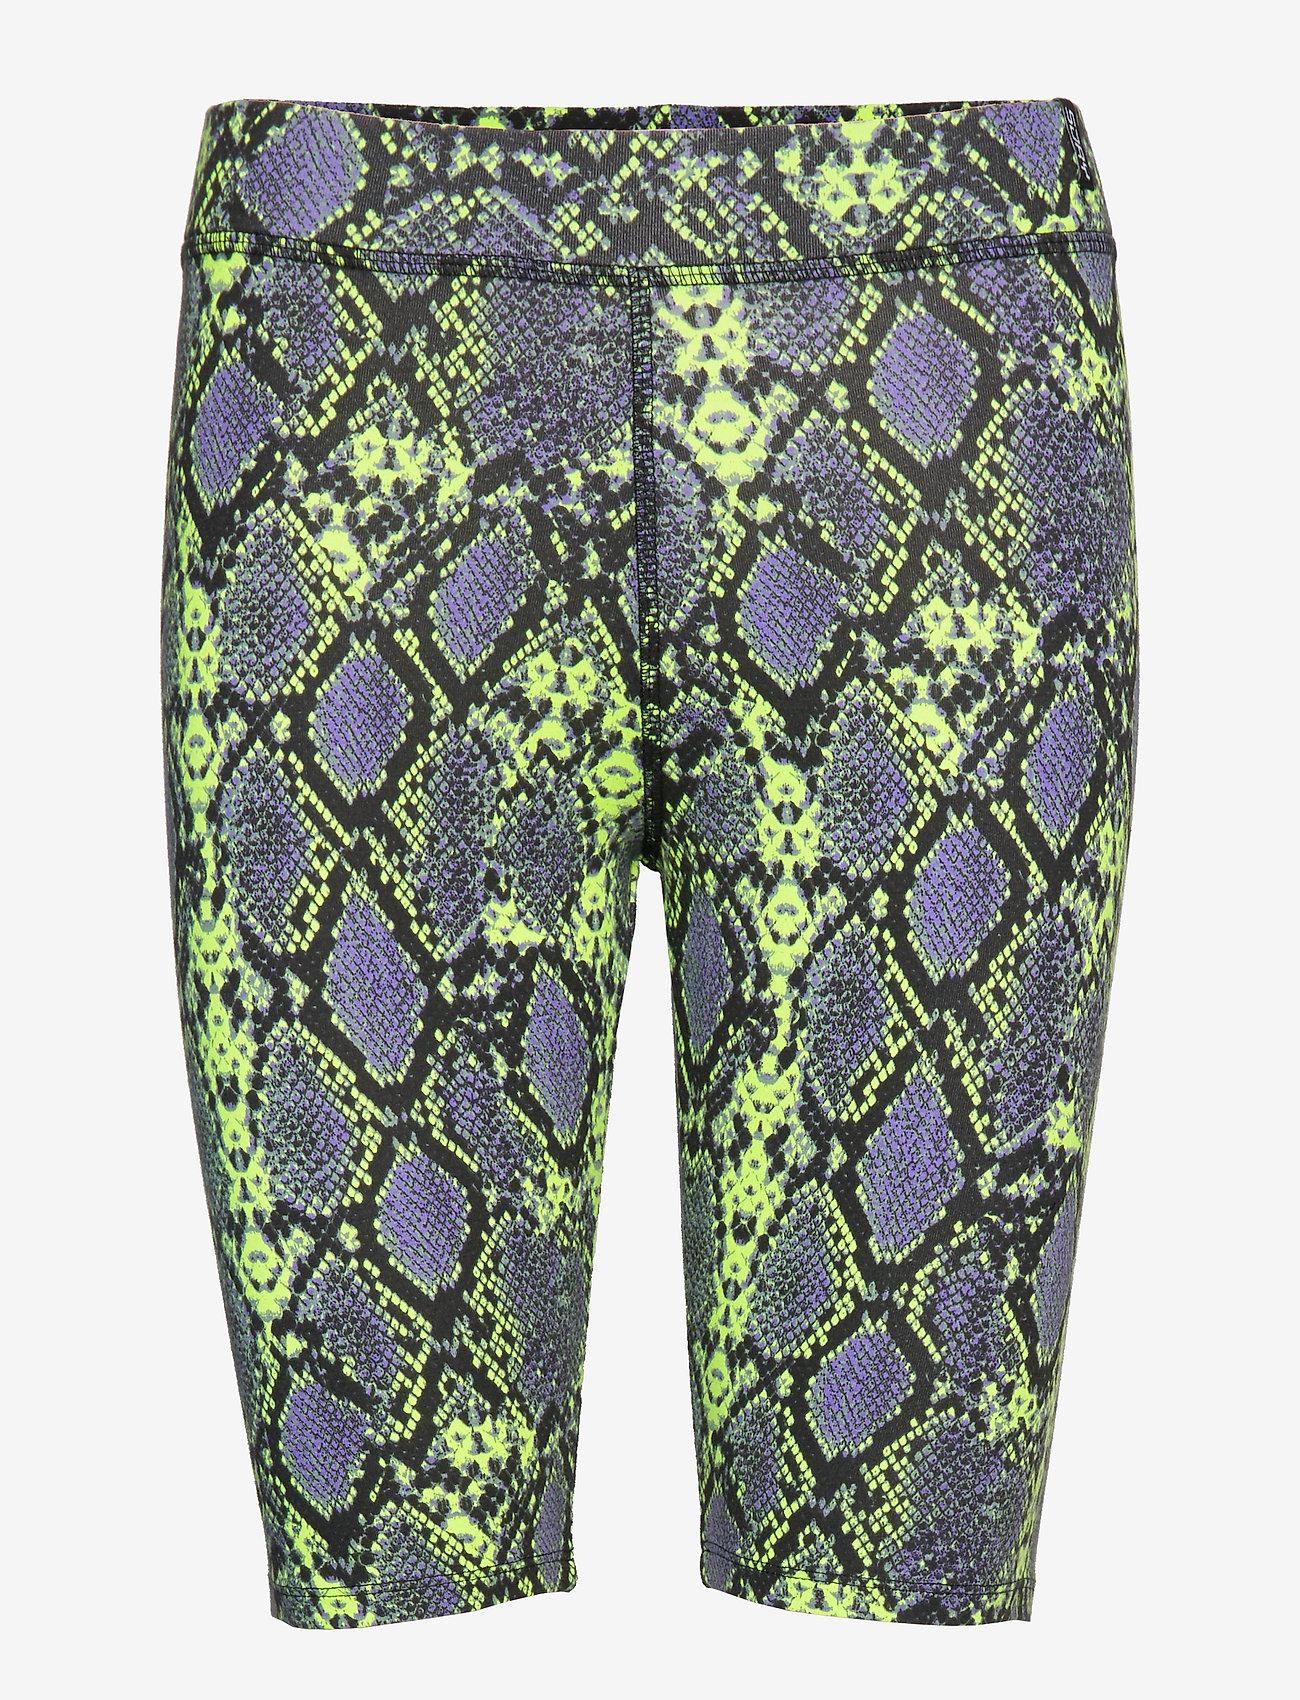 Superdry - DESERT BIKE SHORT - cycling shorts - neon snake print - 0